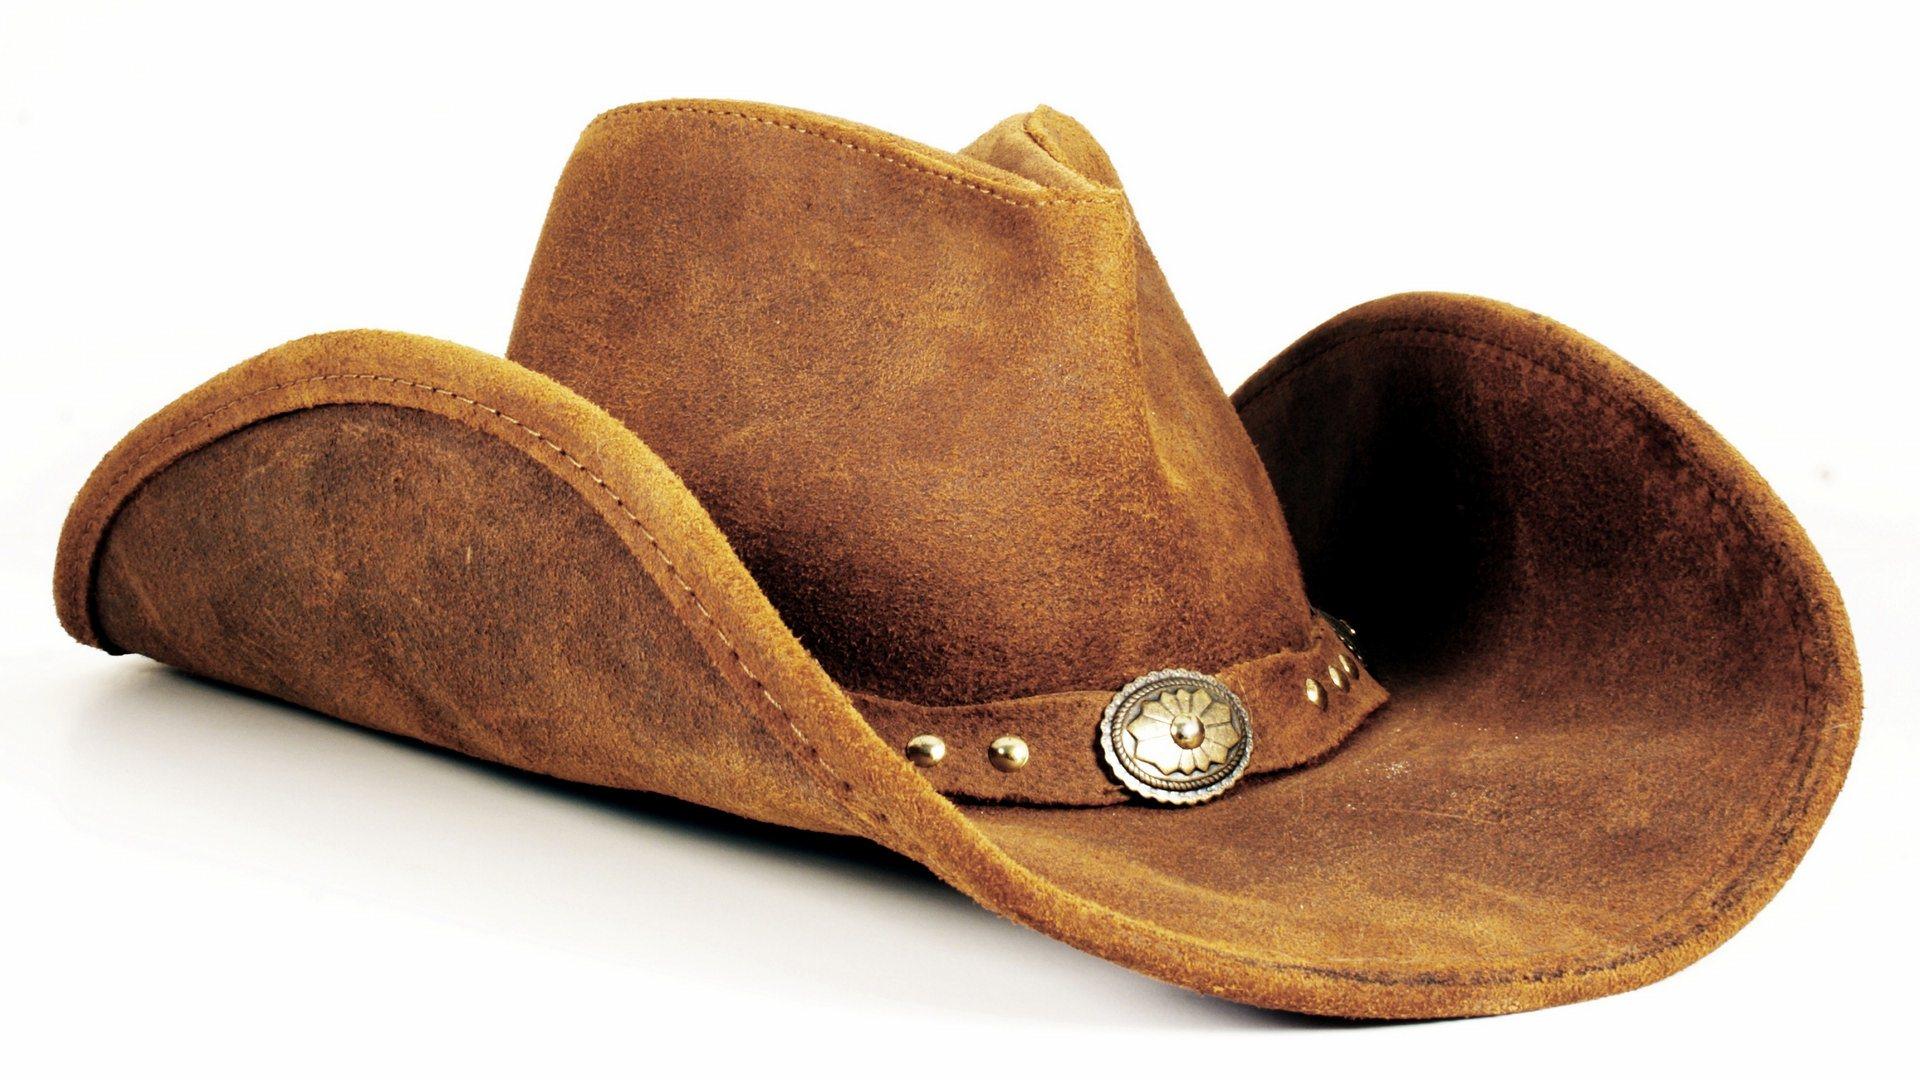 Cowboy Hat HD Wallpapers 1920x1080